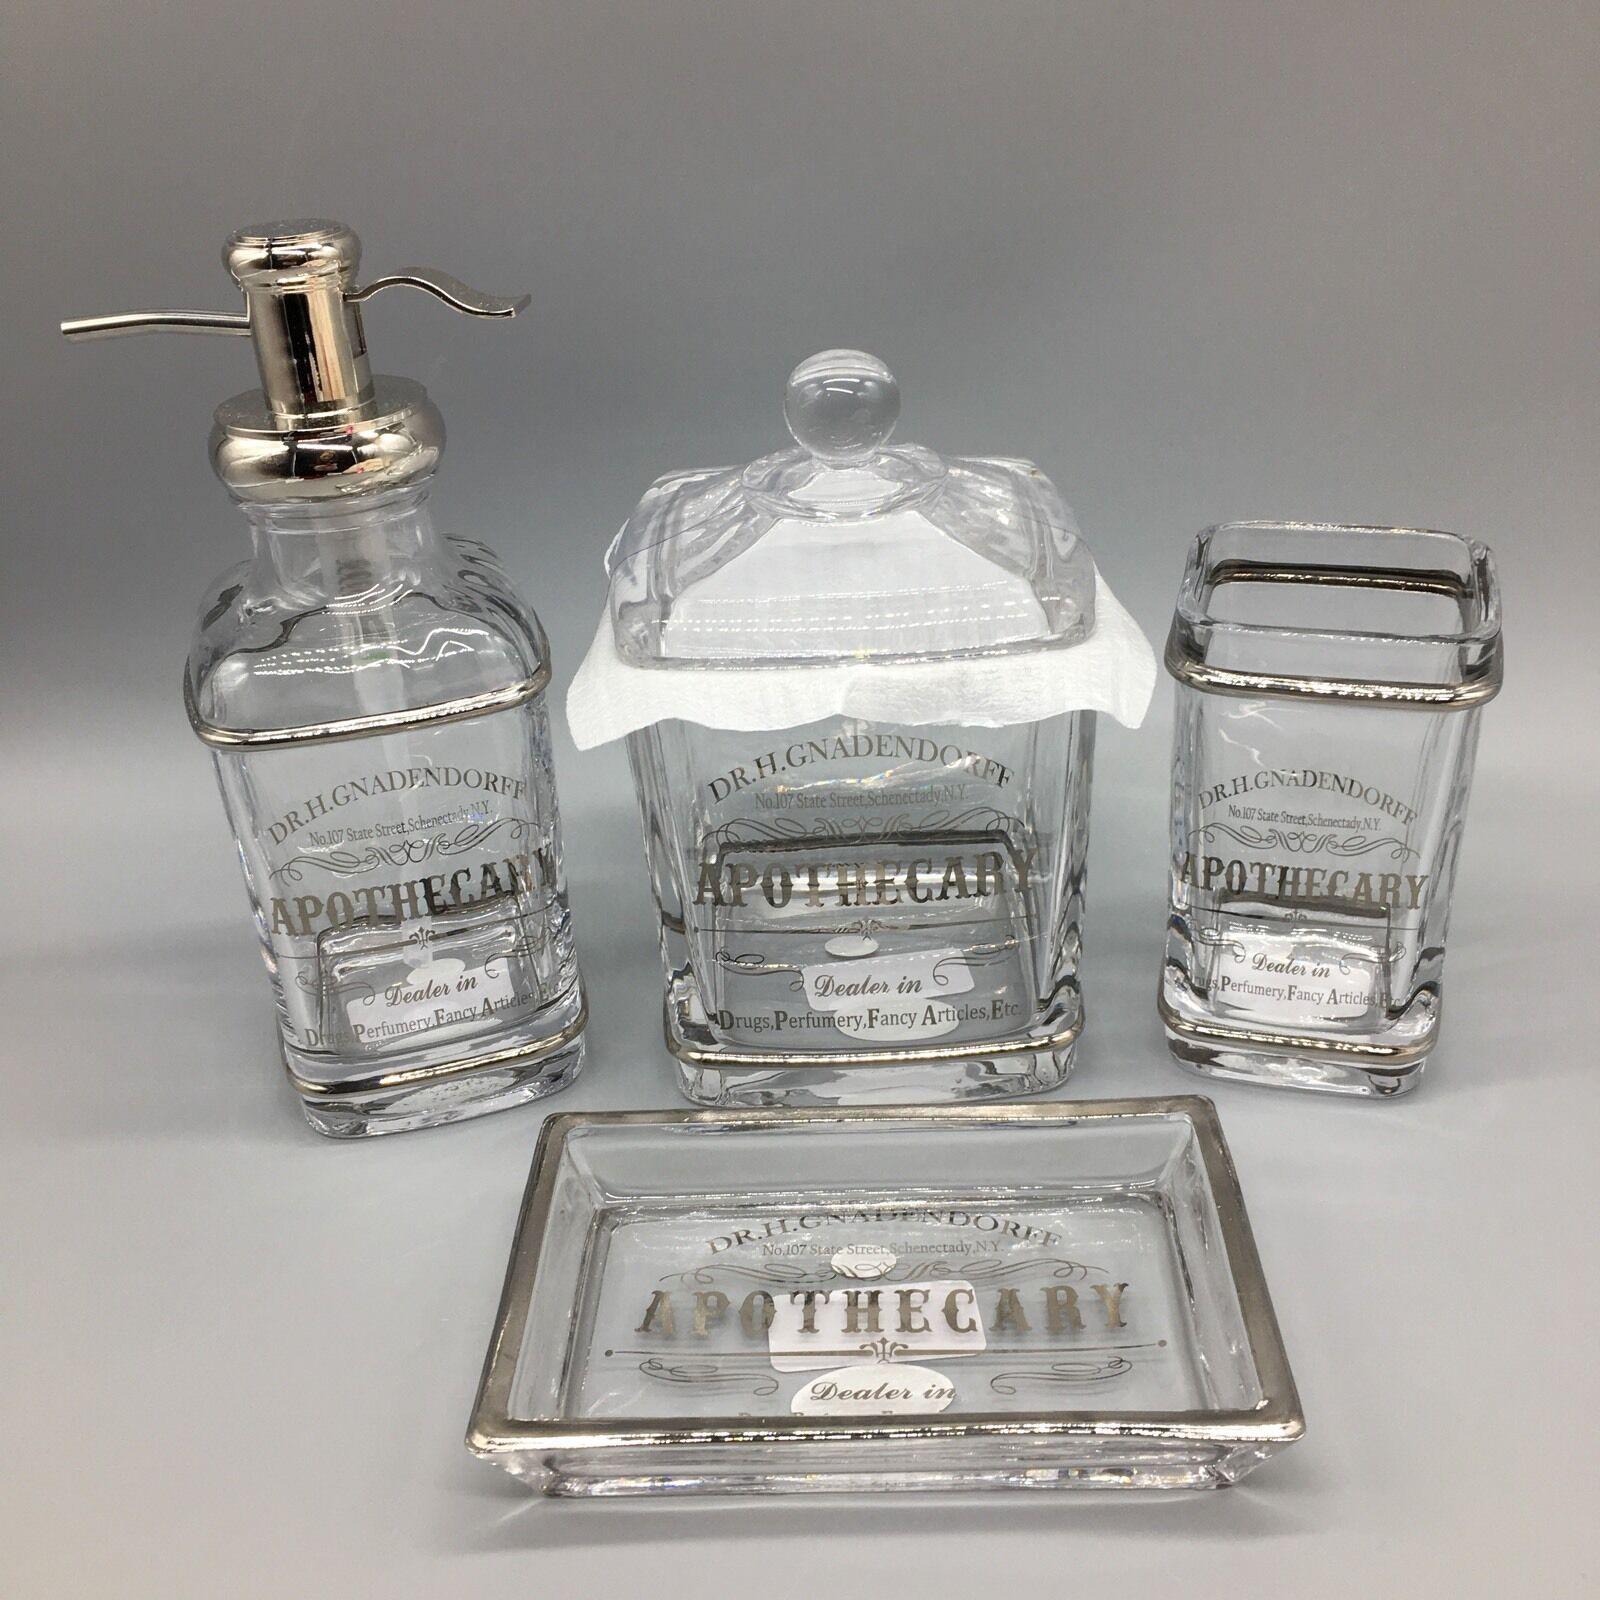 4pc BELLA LUX Parisian Bath Set Dr Apothecary Jar Soap Dispenser Toothbrush NEW